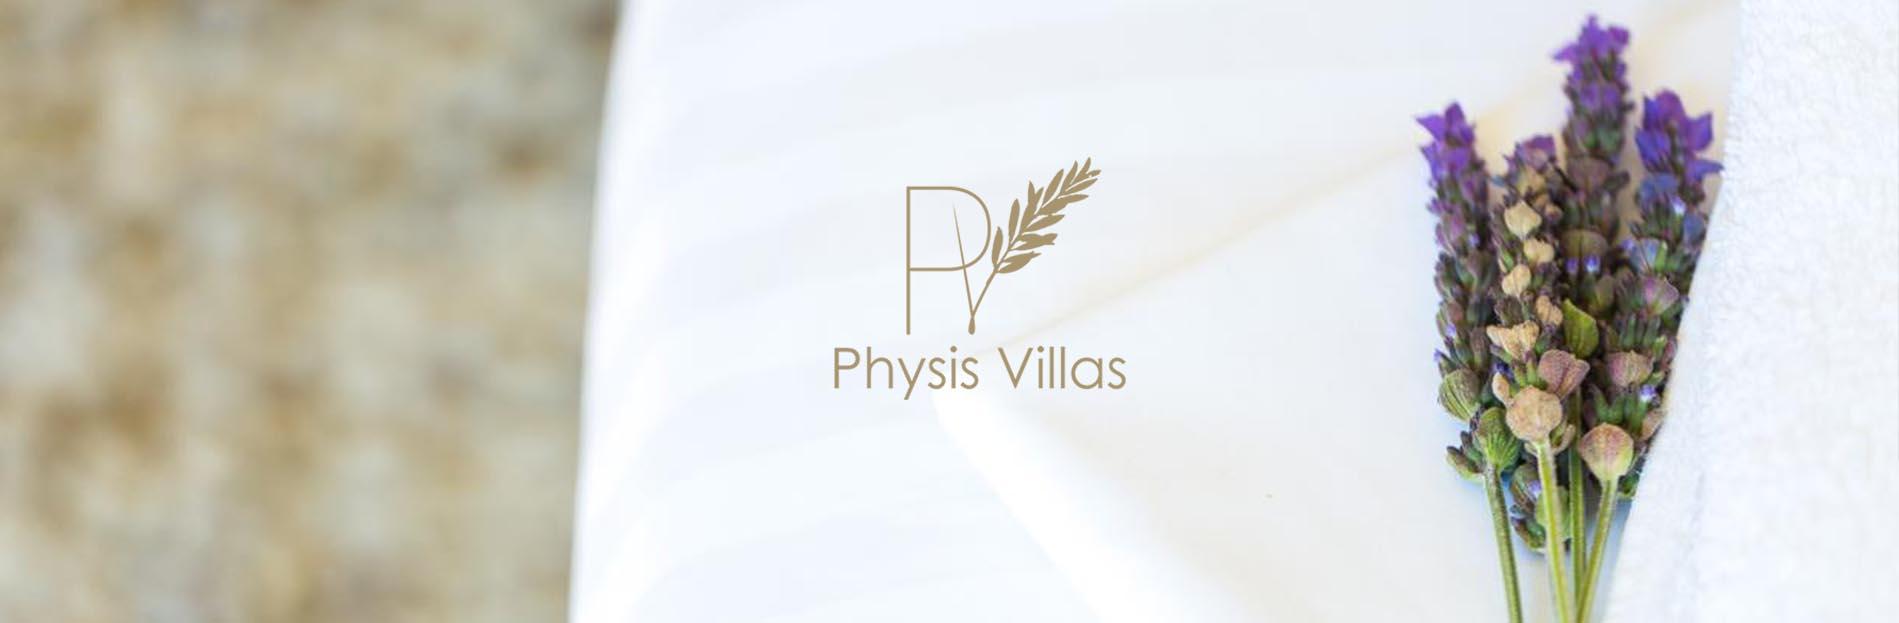 contact us physis villas